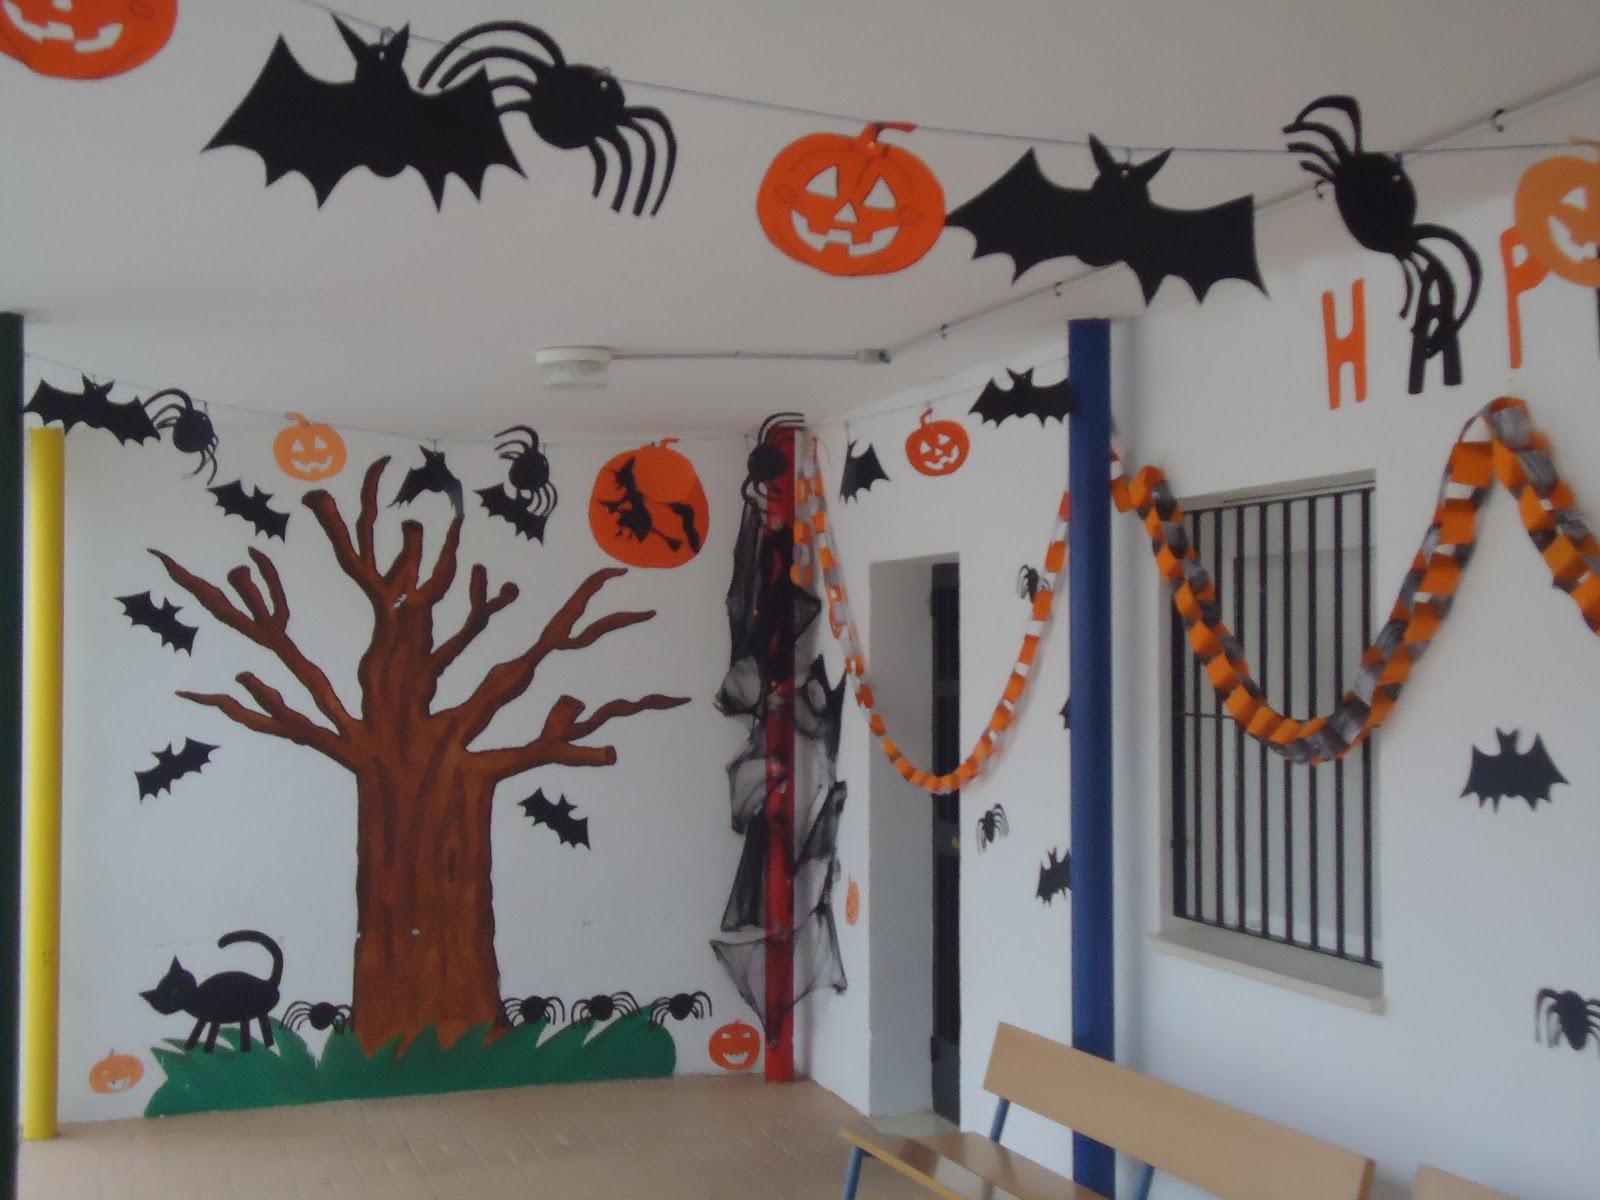 Colegio rodriguez vega de almedinilla c rdoba halloween truco o trato - Decoracion halloween infantil ...